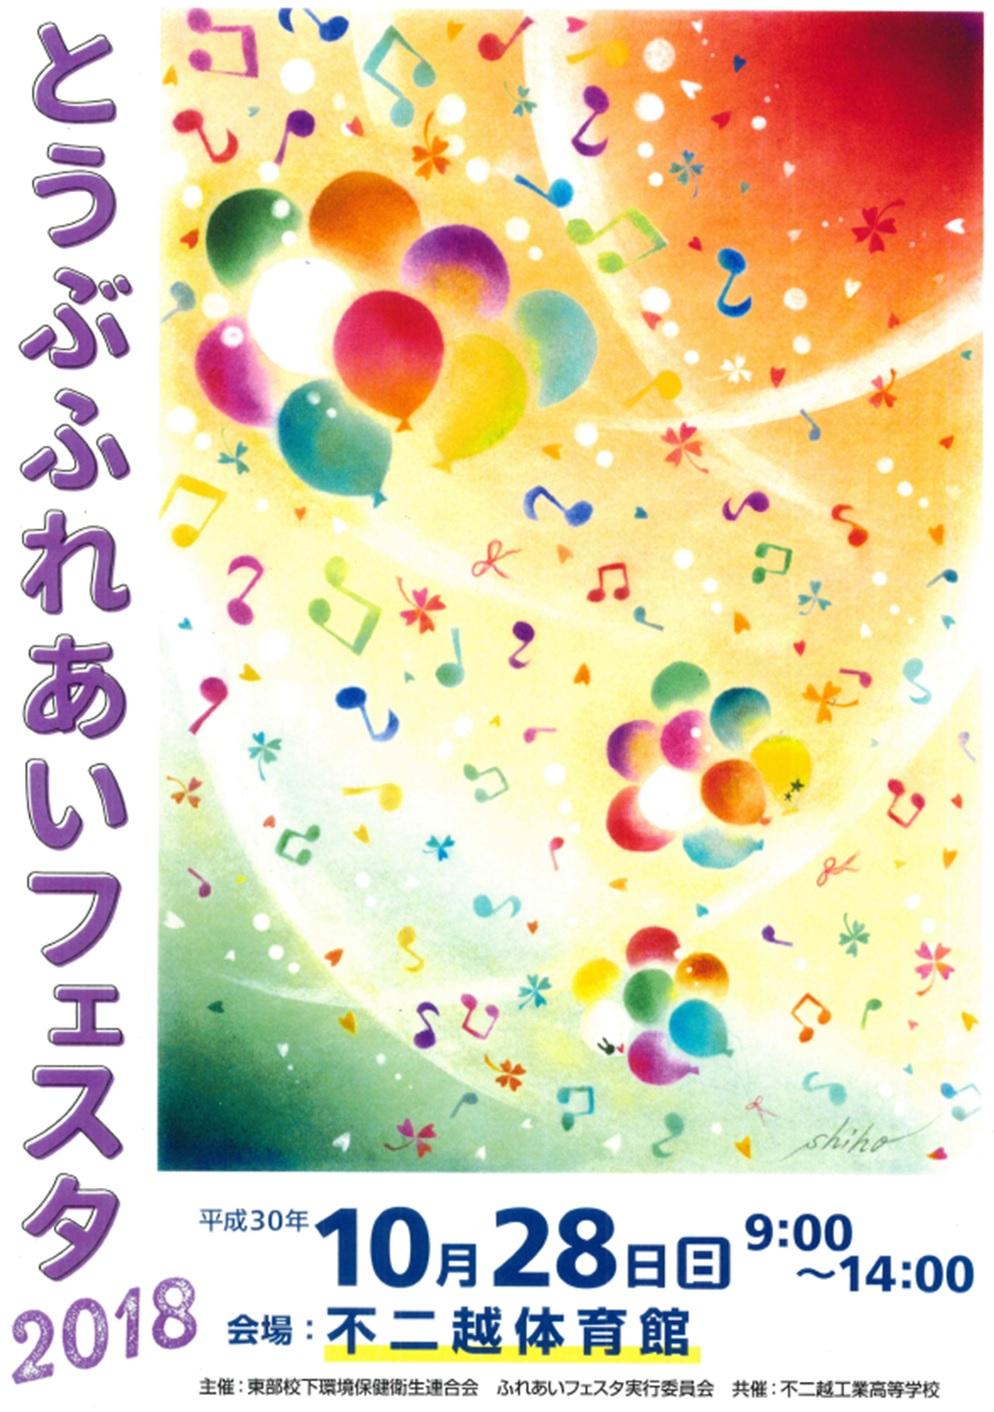 ●HP用 ポスター